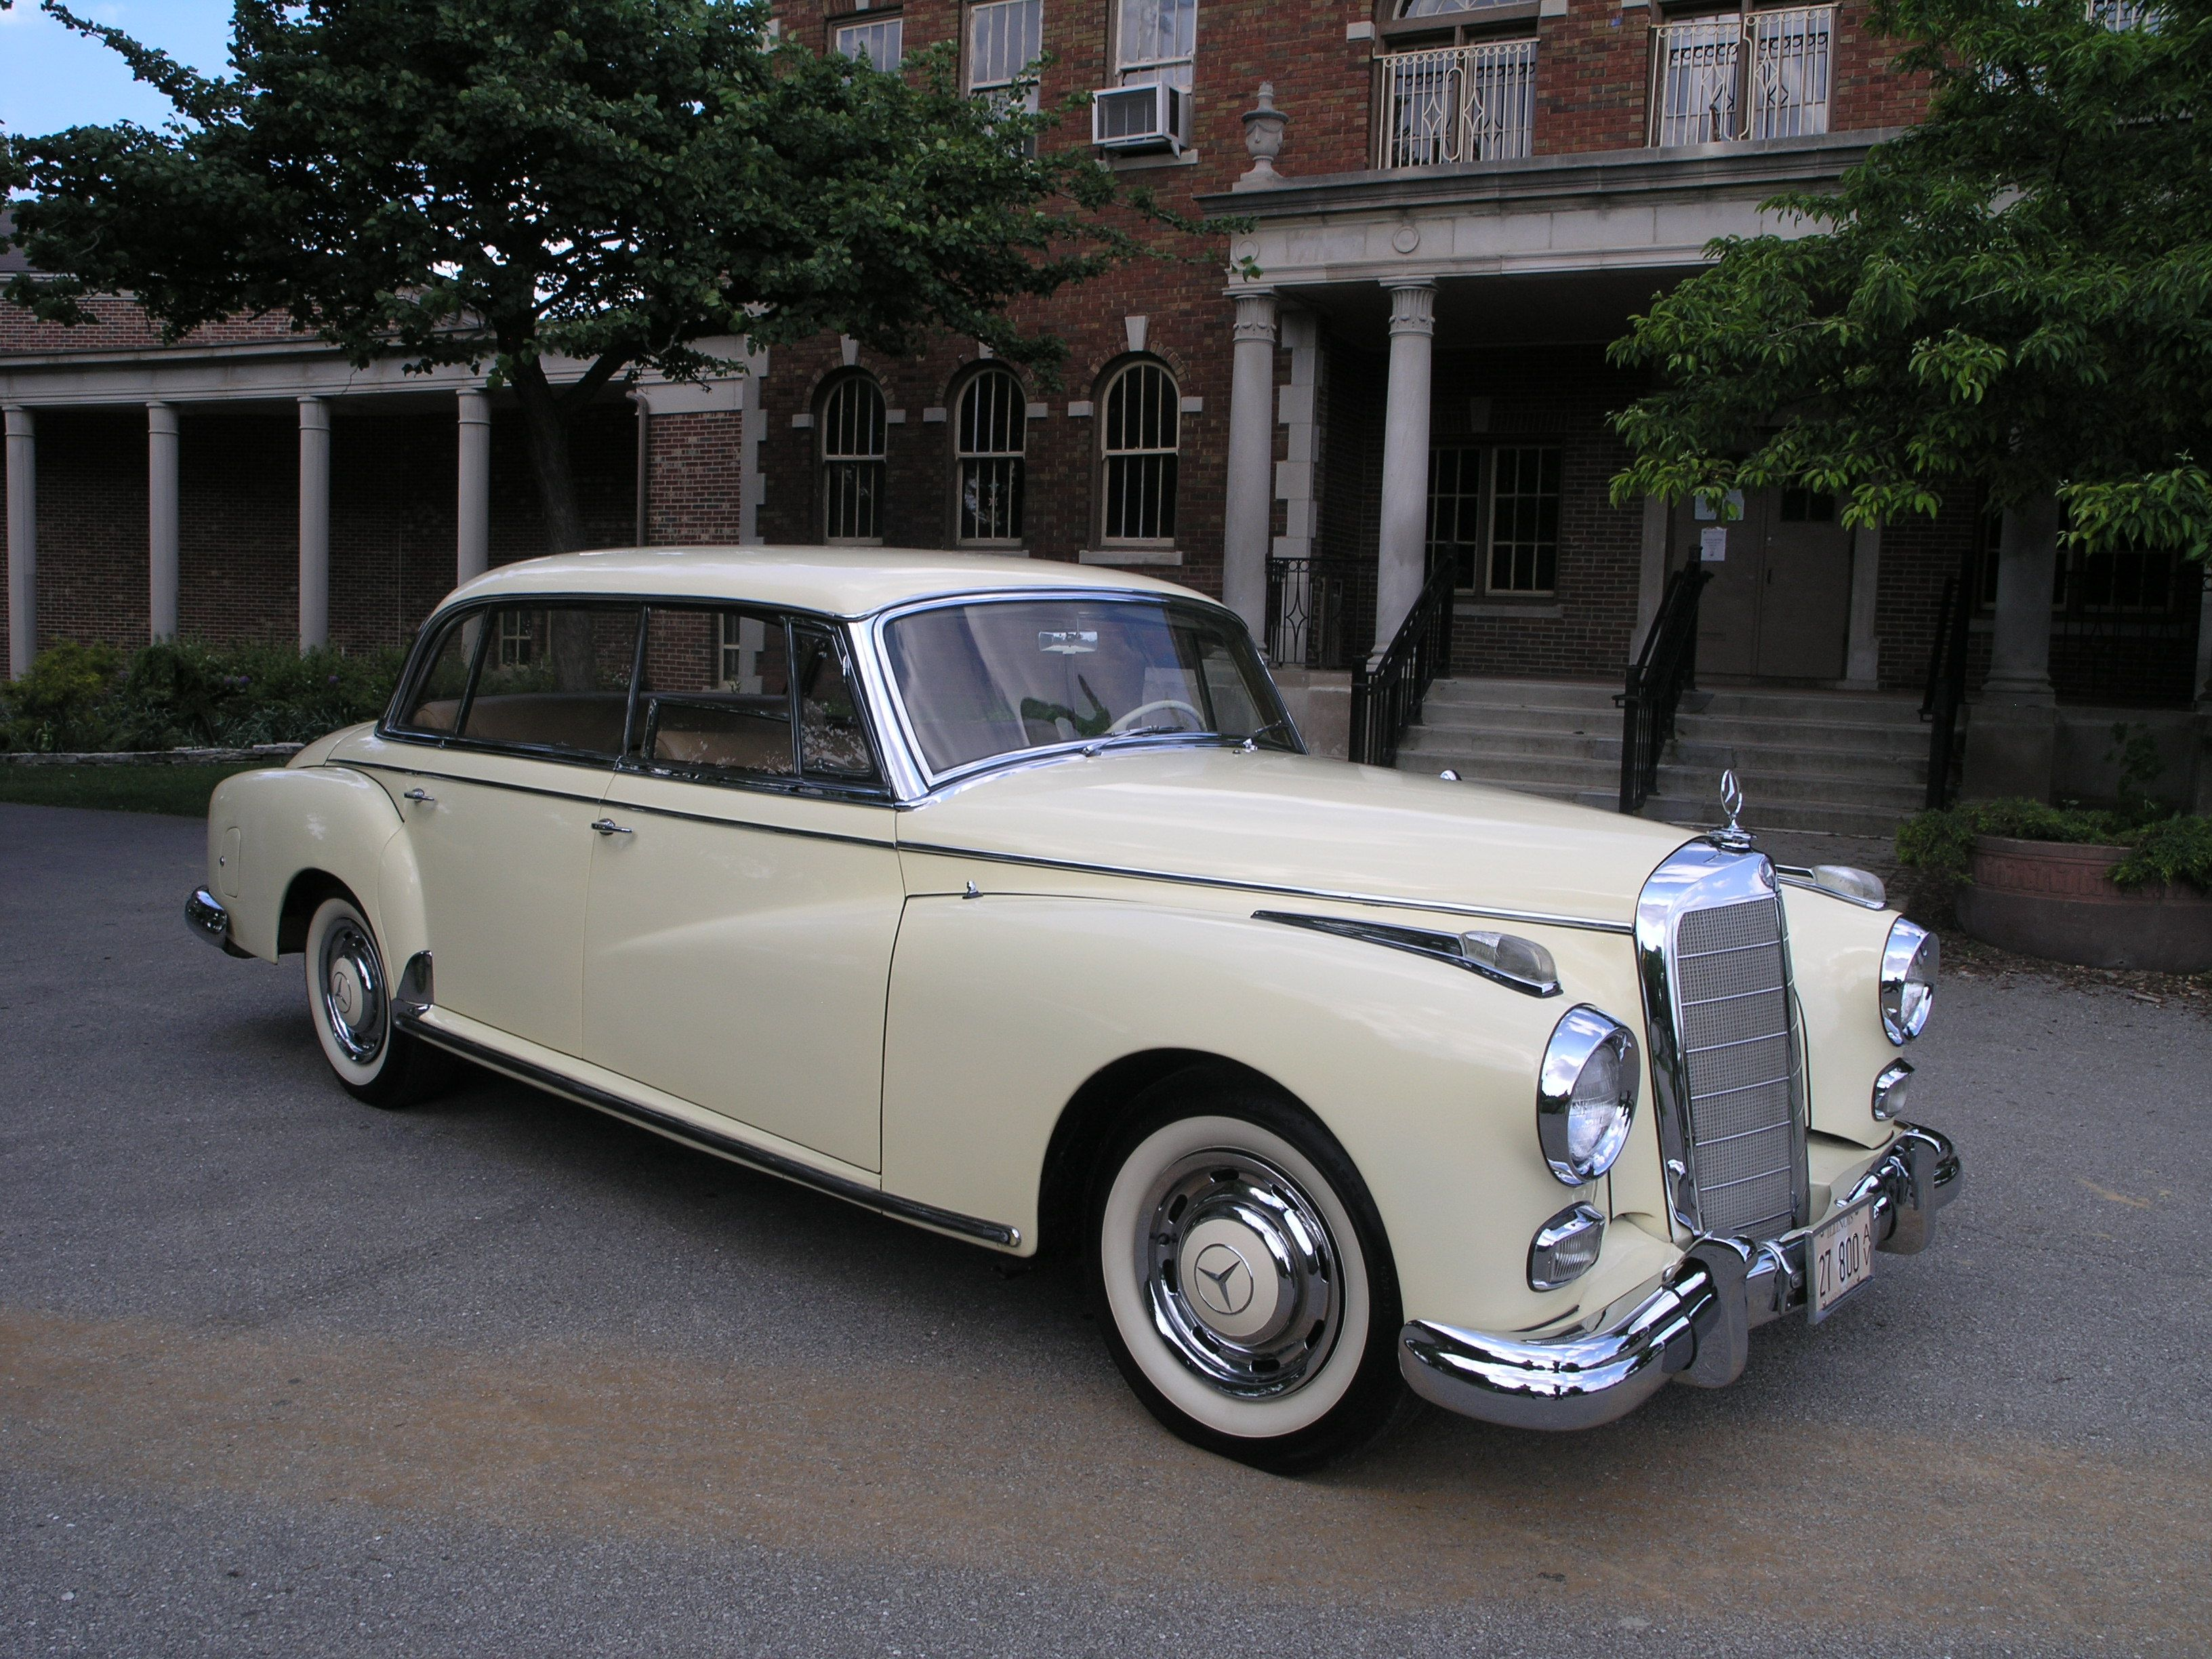 1960 mercedes benz 300 d 39 adenauer 39 mercedes oldies pinterest voitures voitures des. Black Bedroom Furniture Sets. Home Design Ideas